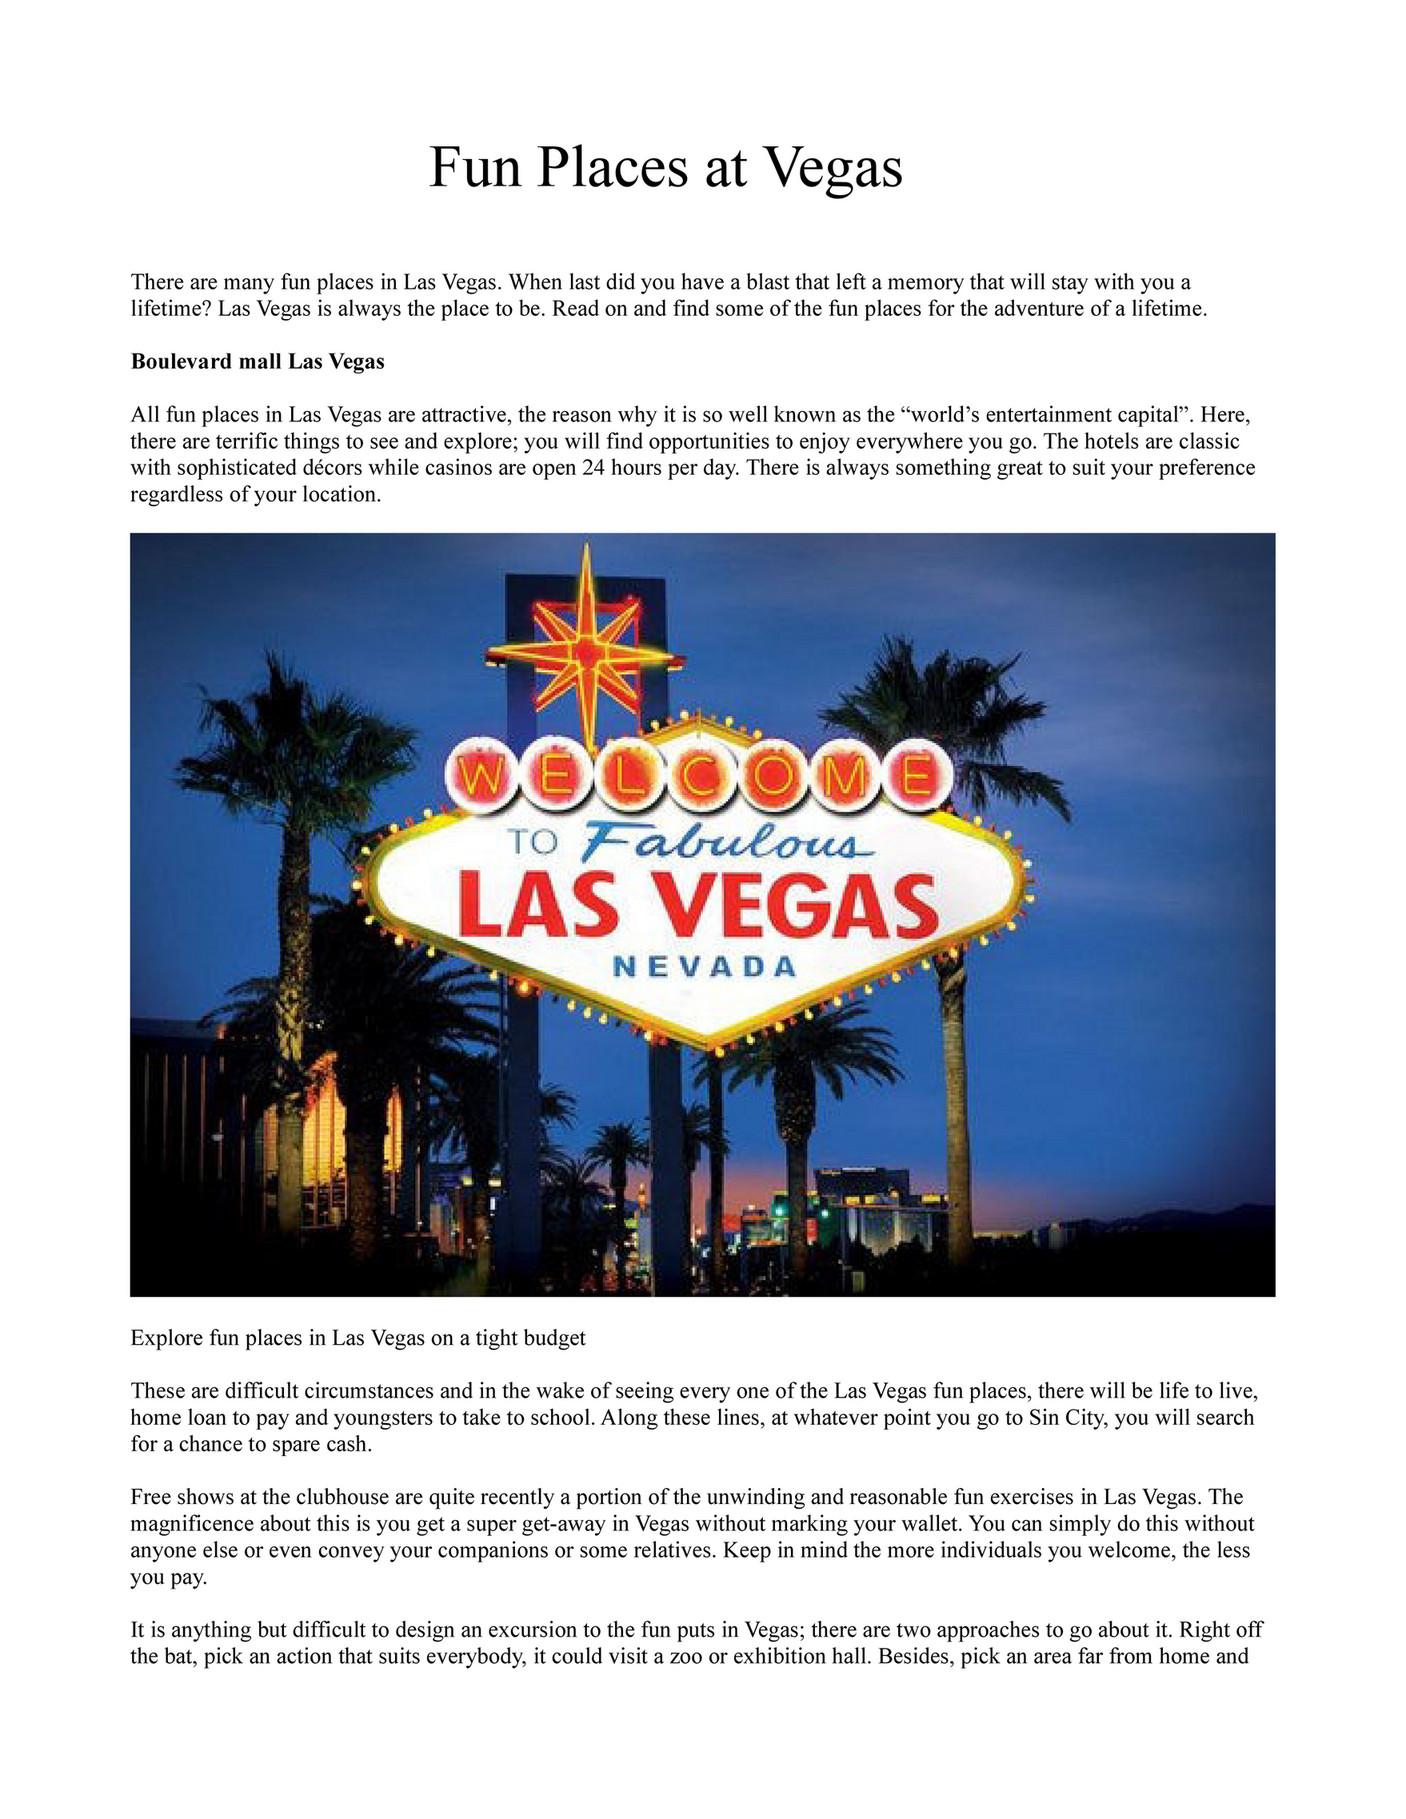 Faremachine - Fun places in Las Vegas - Page 2-3 - Created